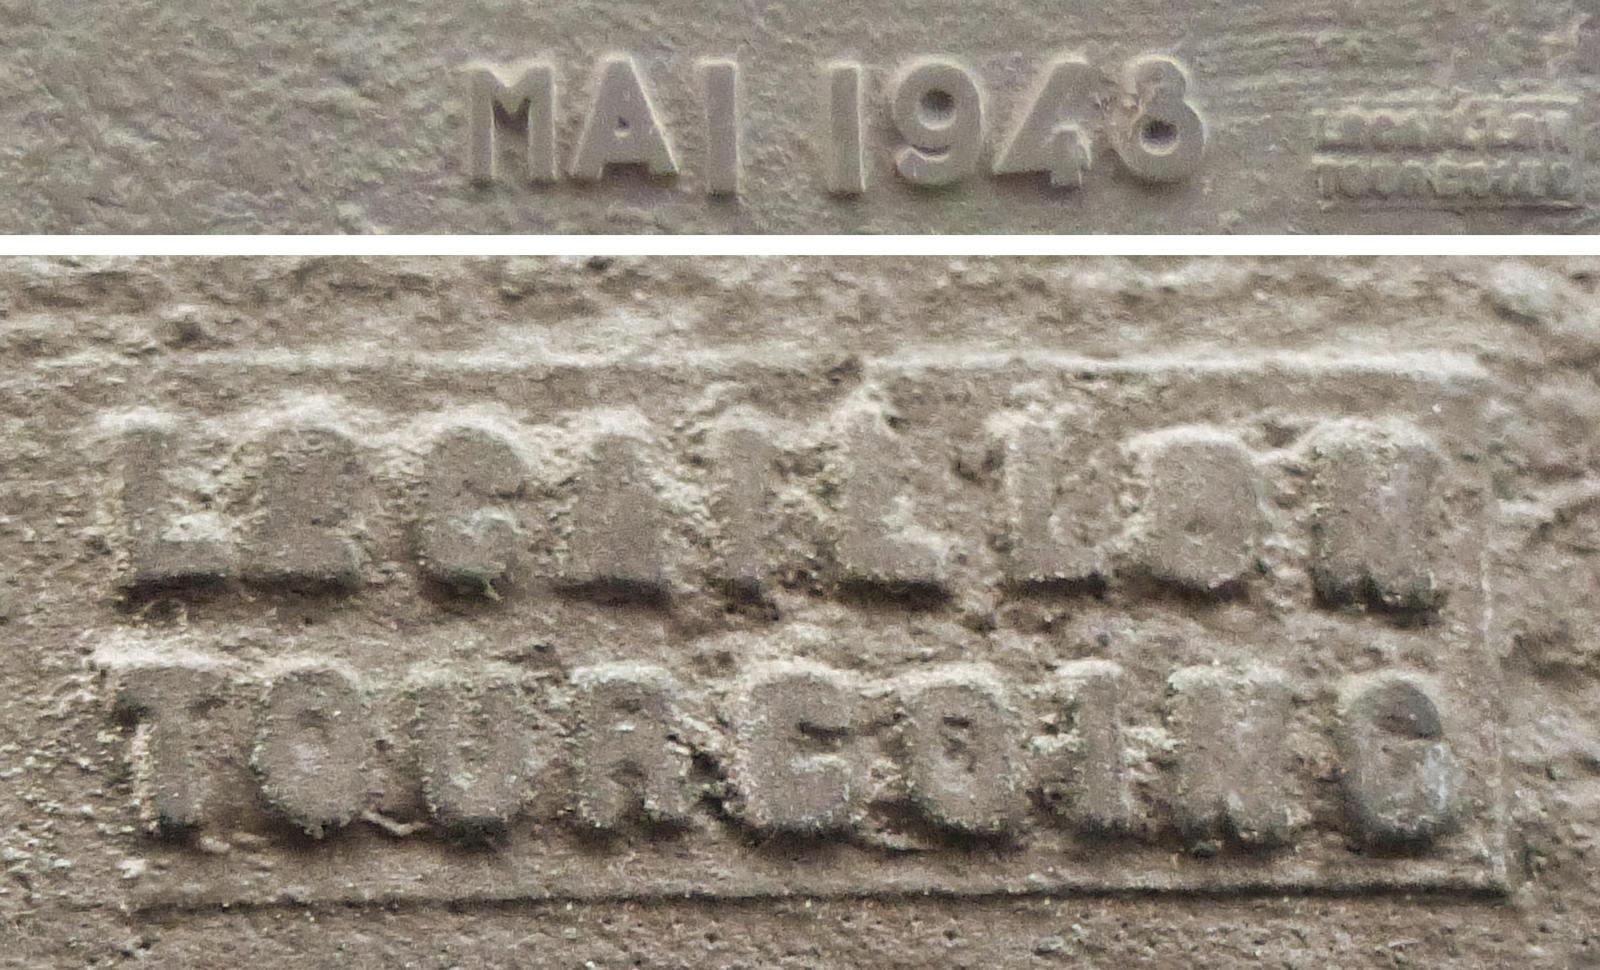 Plaque Lecaillon Tourcoing, 1948 - Ruelle des Madrilles